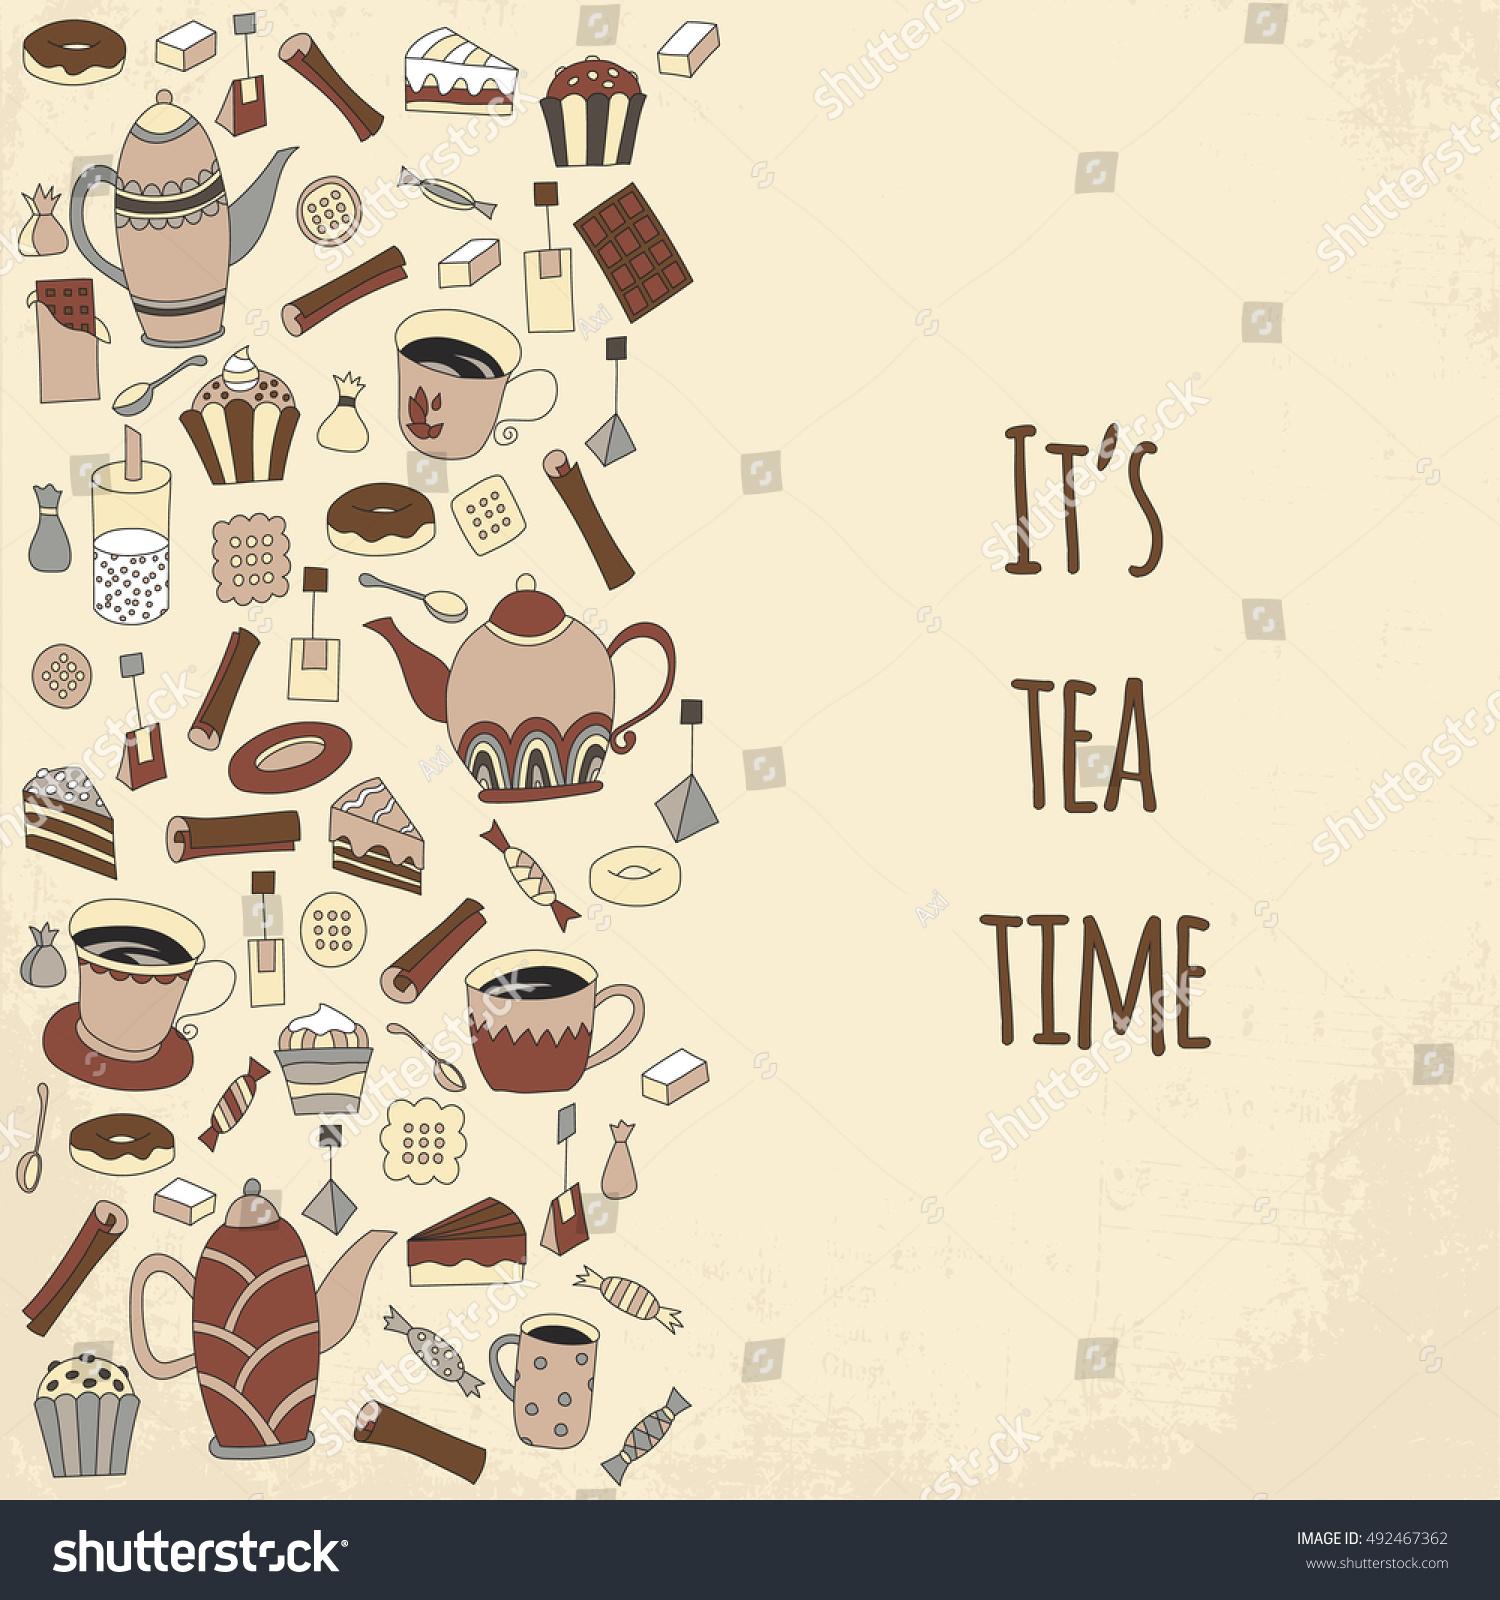 Tea Time Vector Illustration Hand Drawn Stock Vector Royalty Free